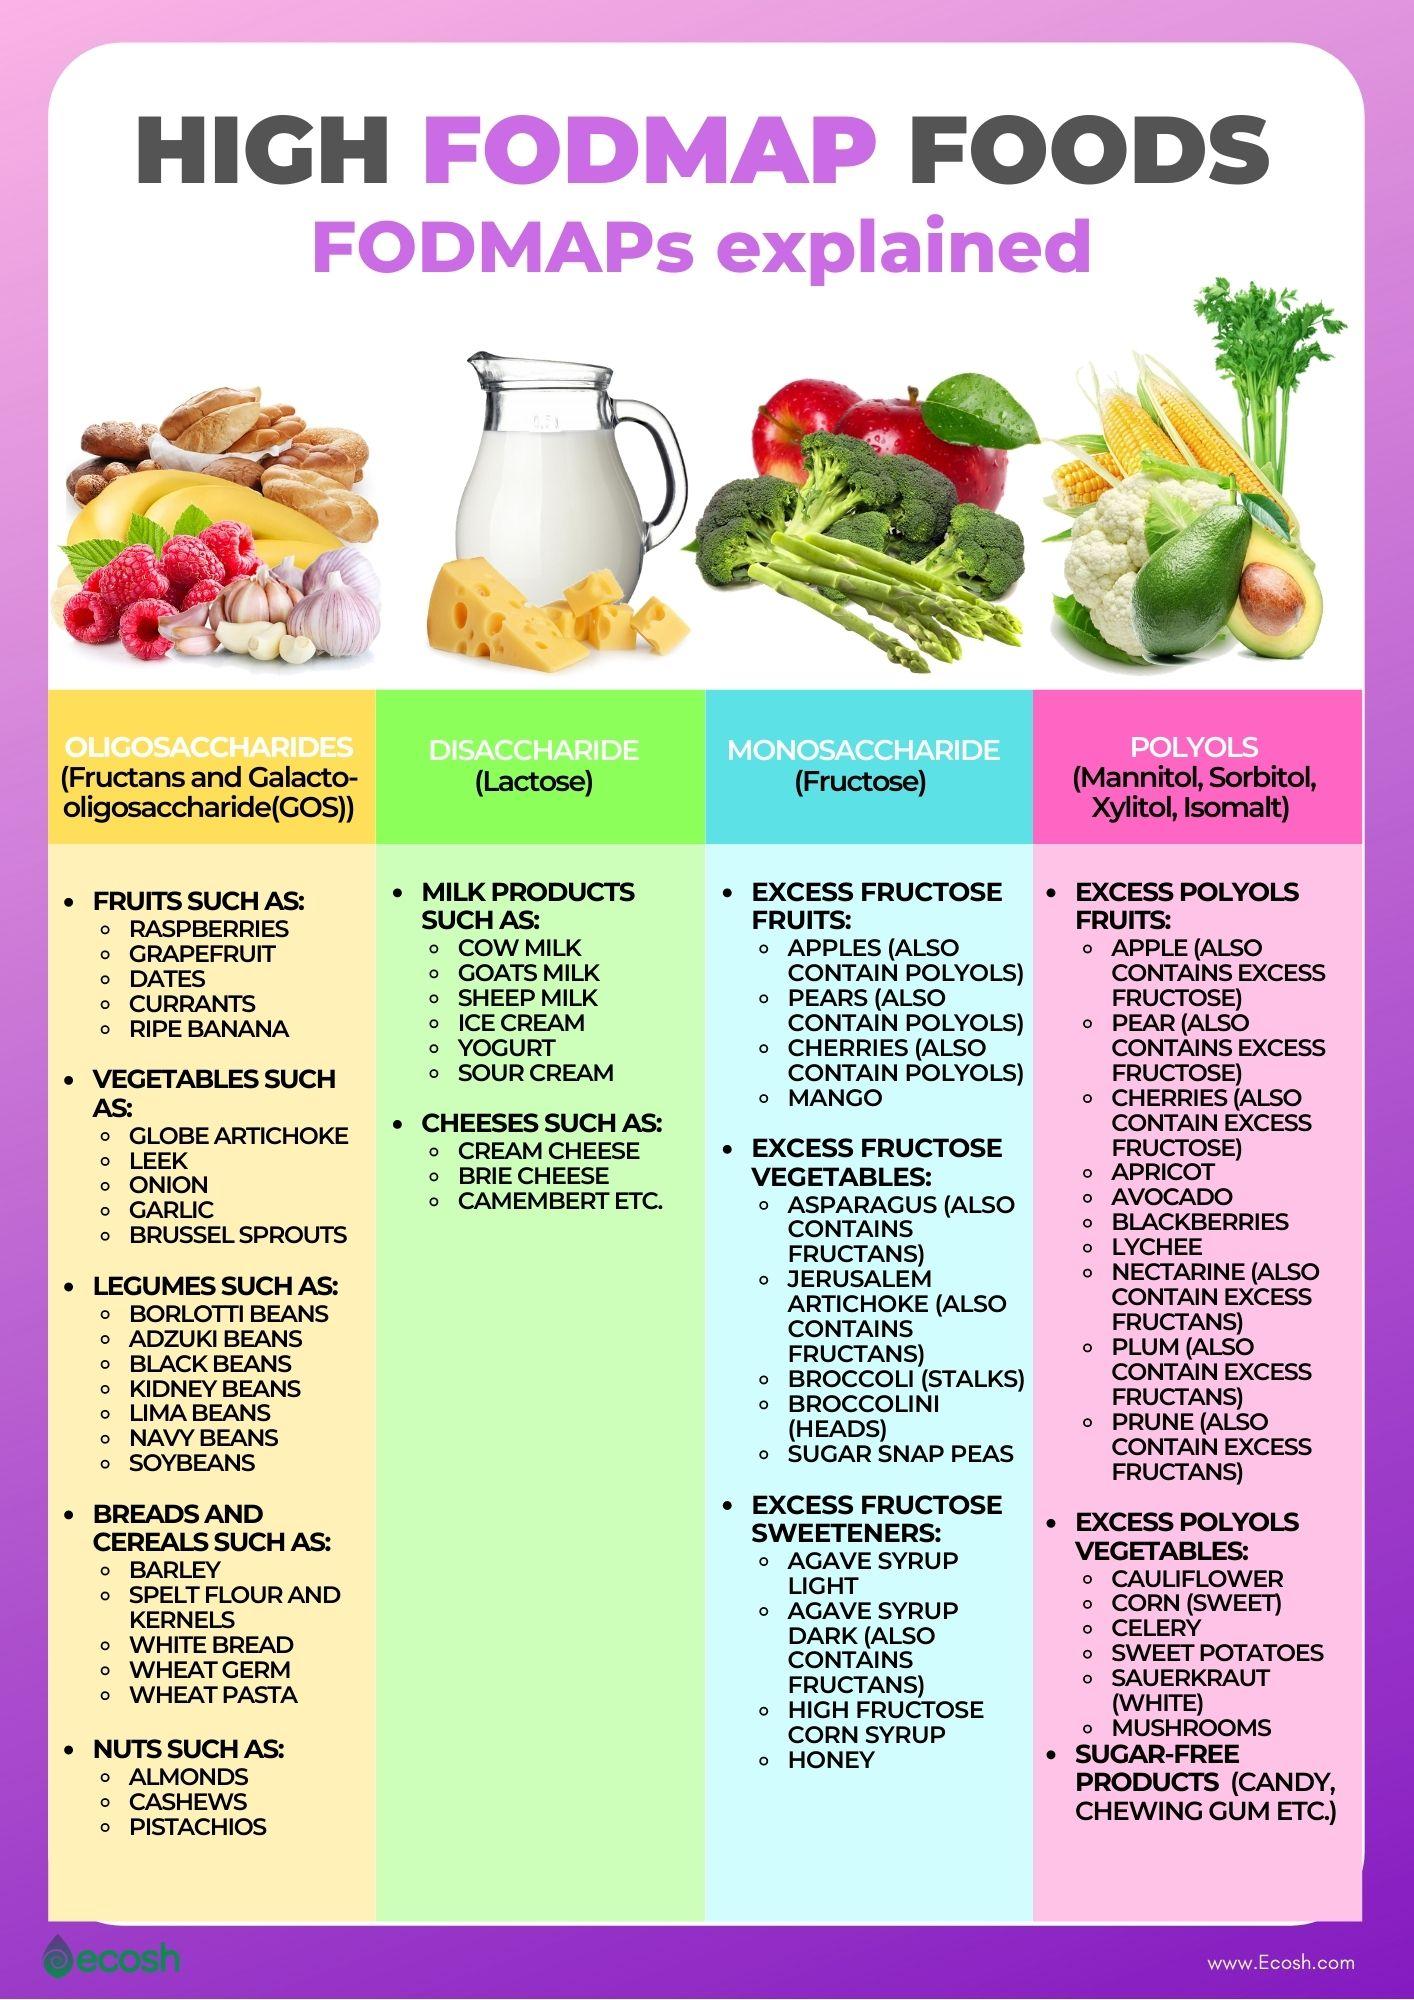 High_FODMAP_Foods_Oligosaccharides_or_Oligos_(Fructans and Galacto-oligosaccharide(GOS))_Disaccharide_Milk_Sugar_(Lactose)_Monosaccaride_(Fructose)_Polyols_Sugar_Alcohols_(Mannitol)_